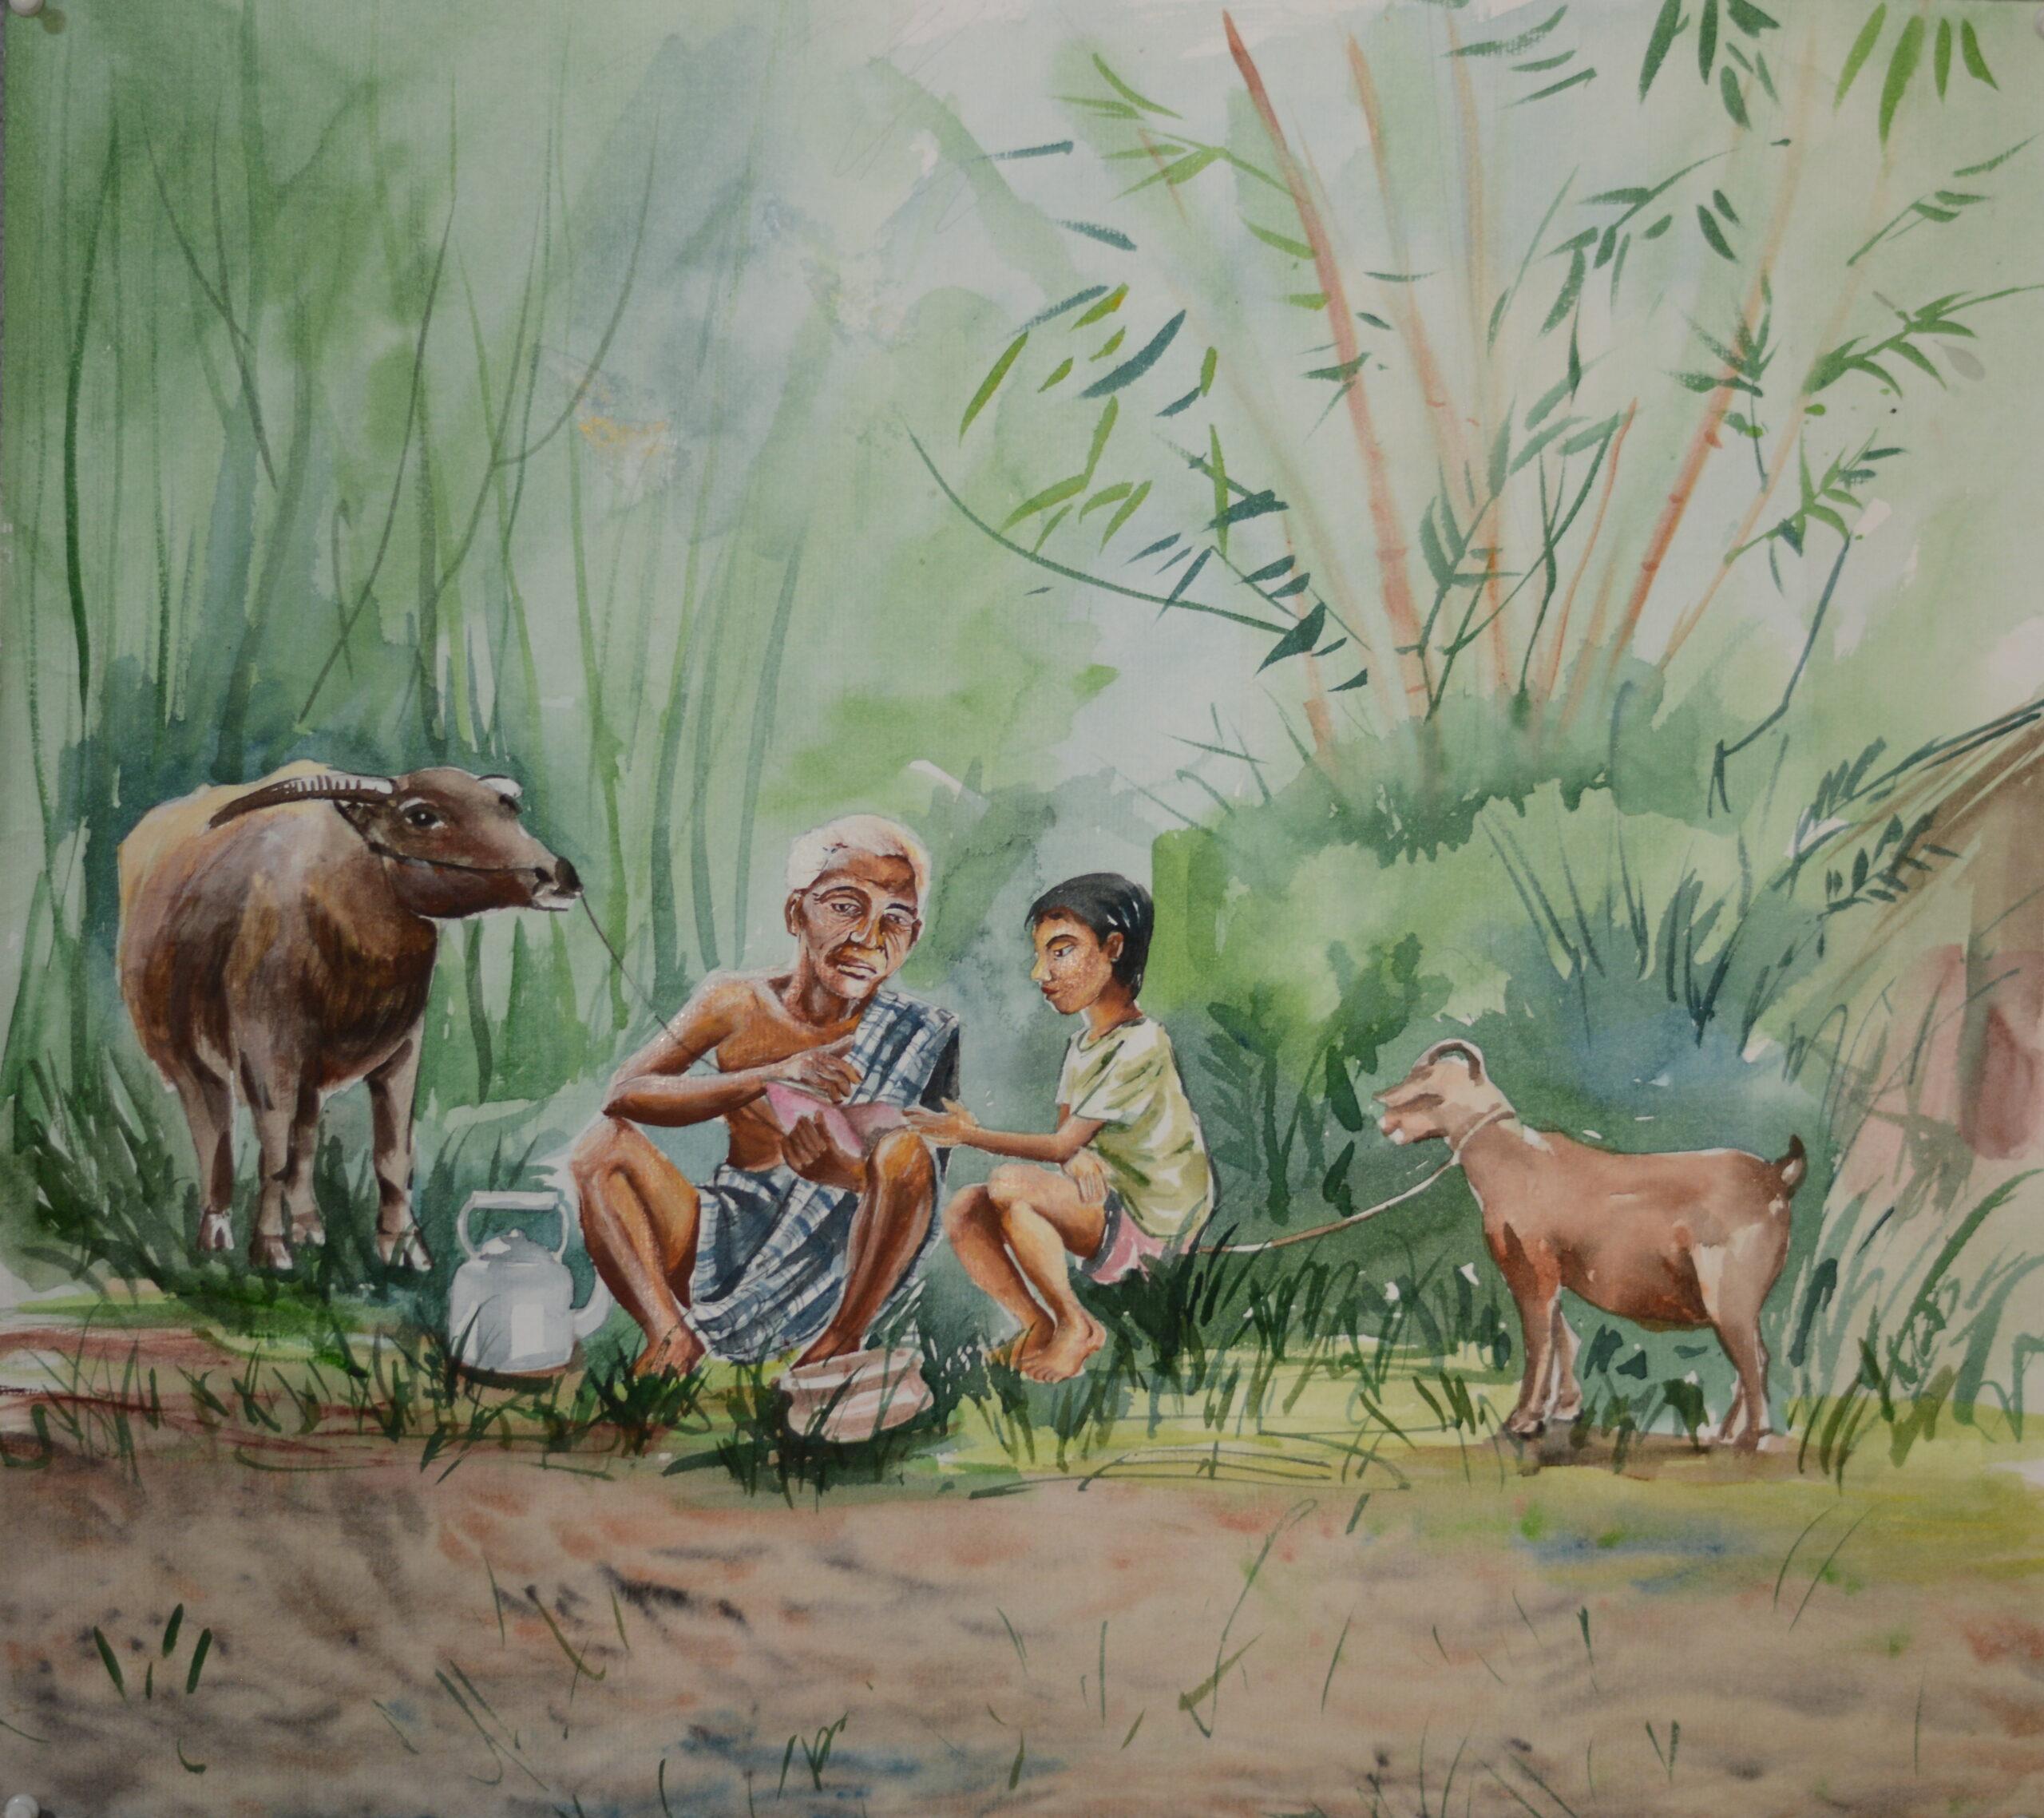 The importance of education_W. A. Lakshan Jayathunga